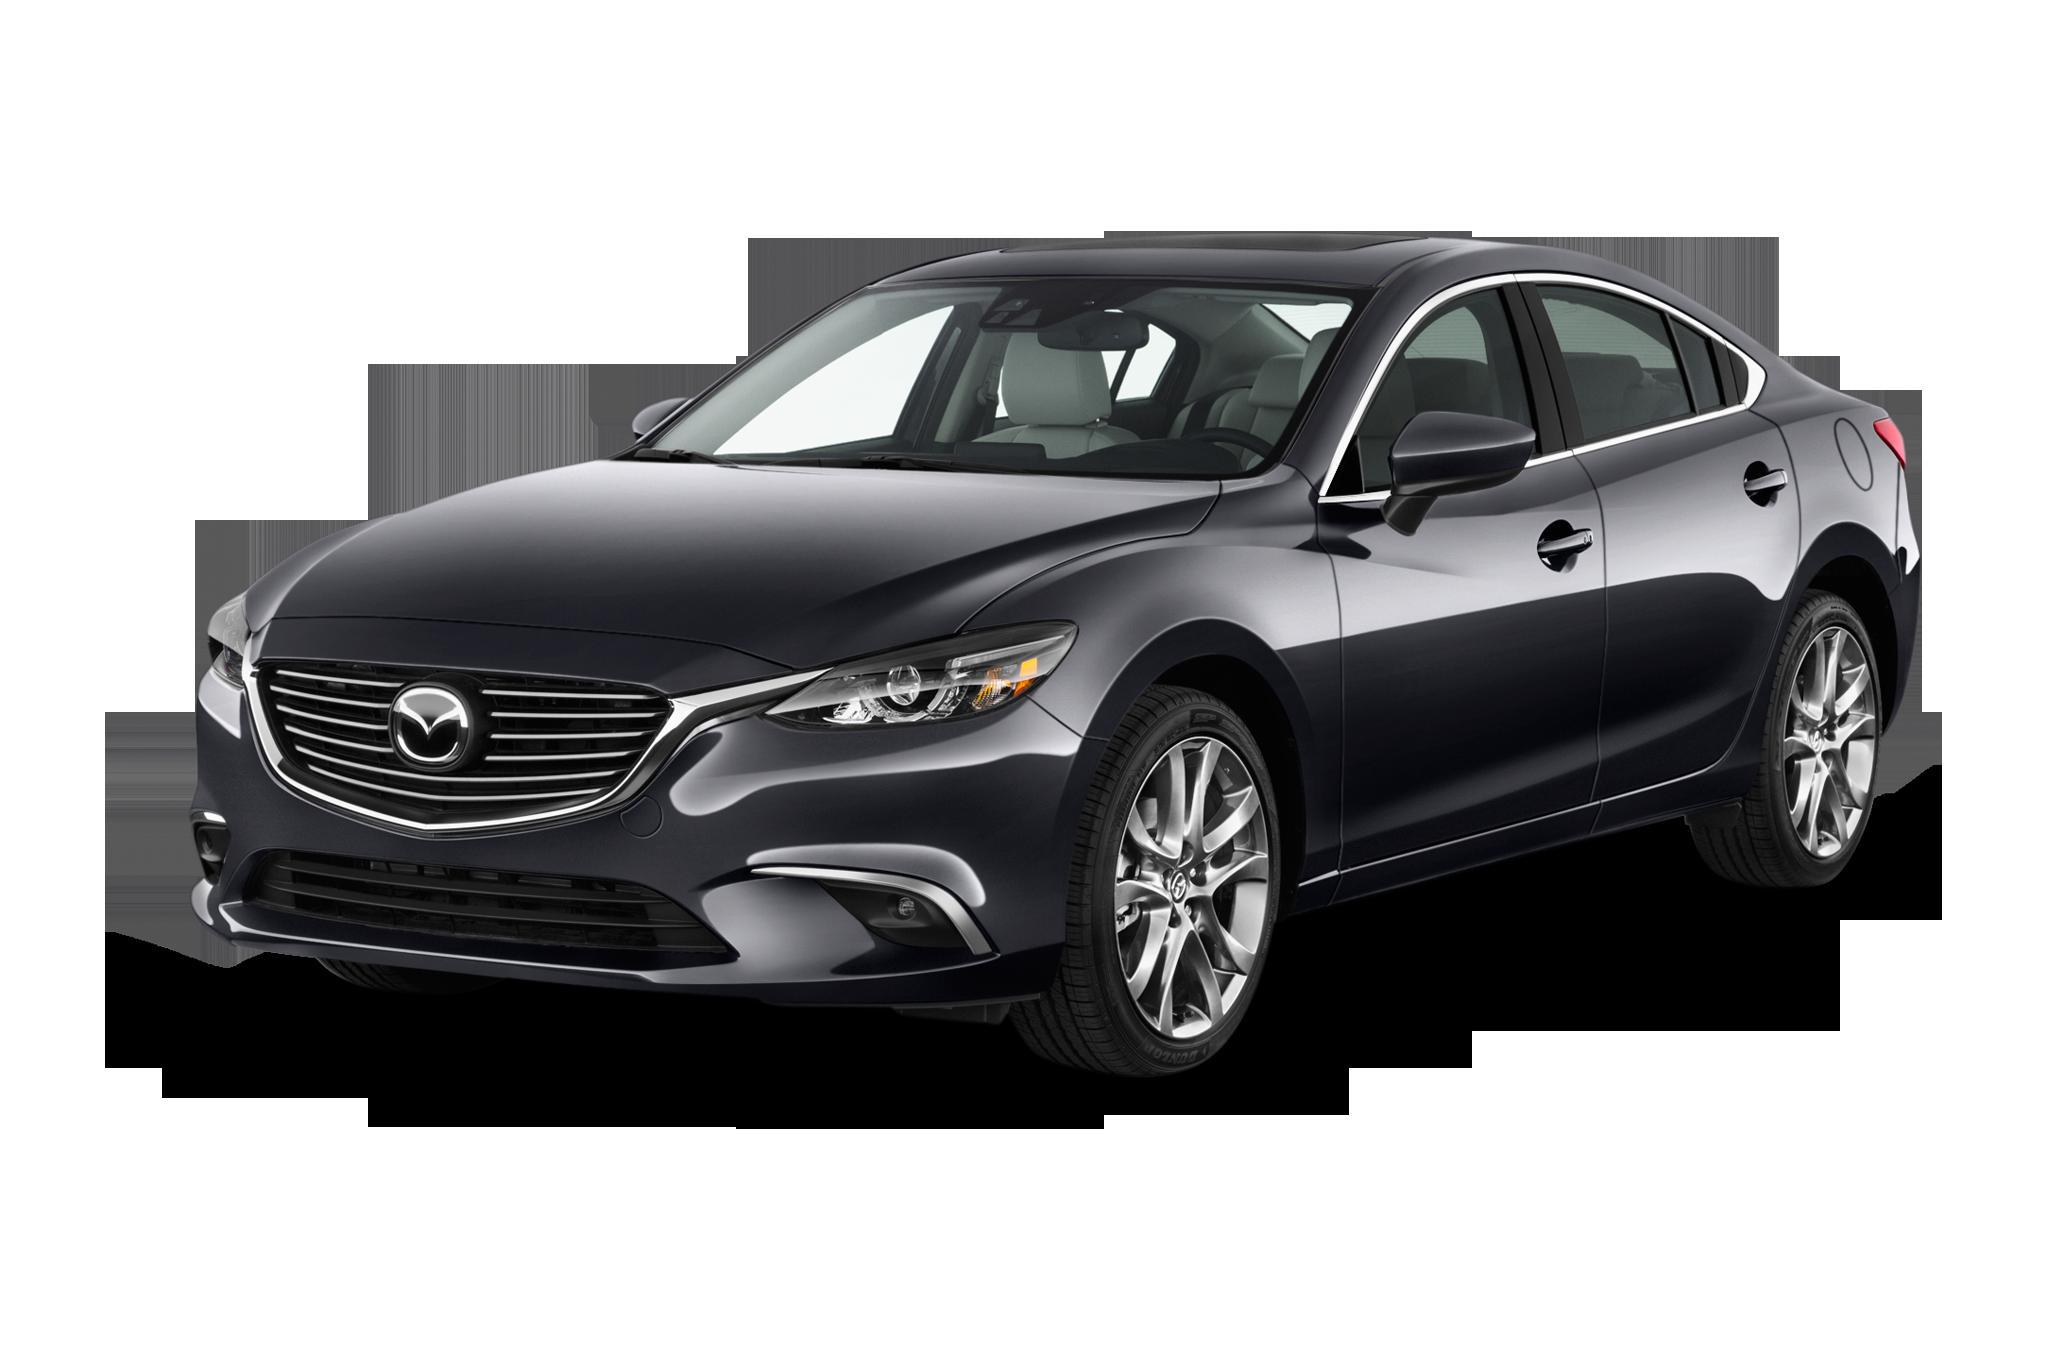 New 2016 Mazda 6 Coupe Price